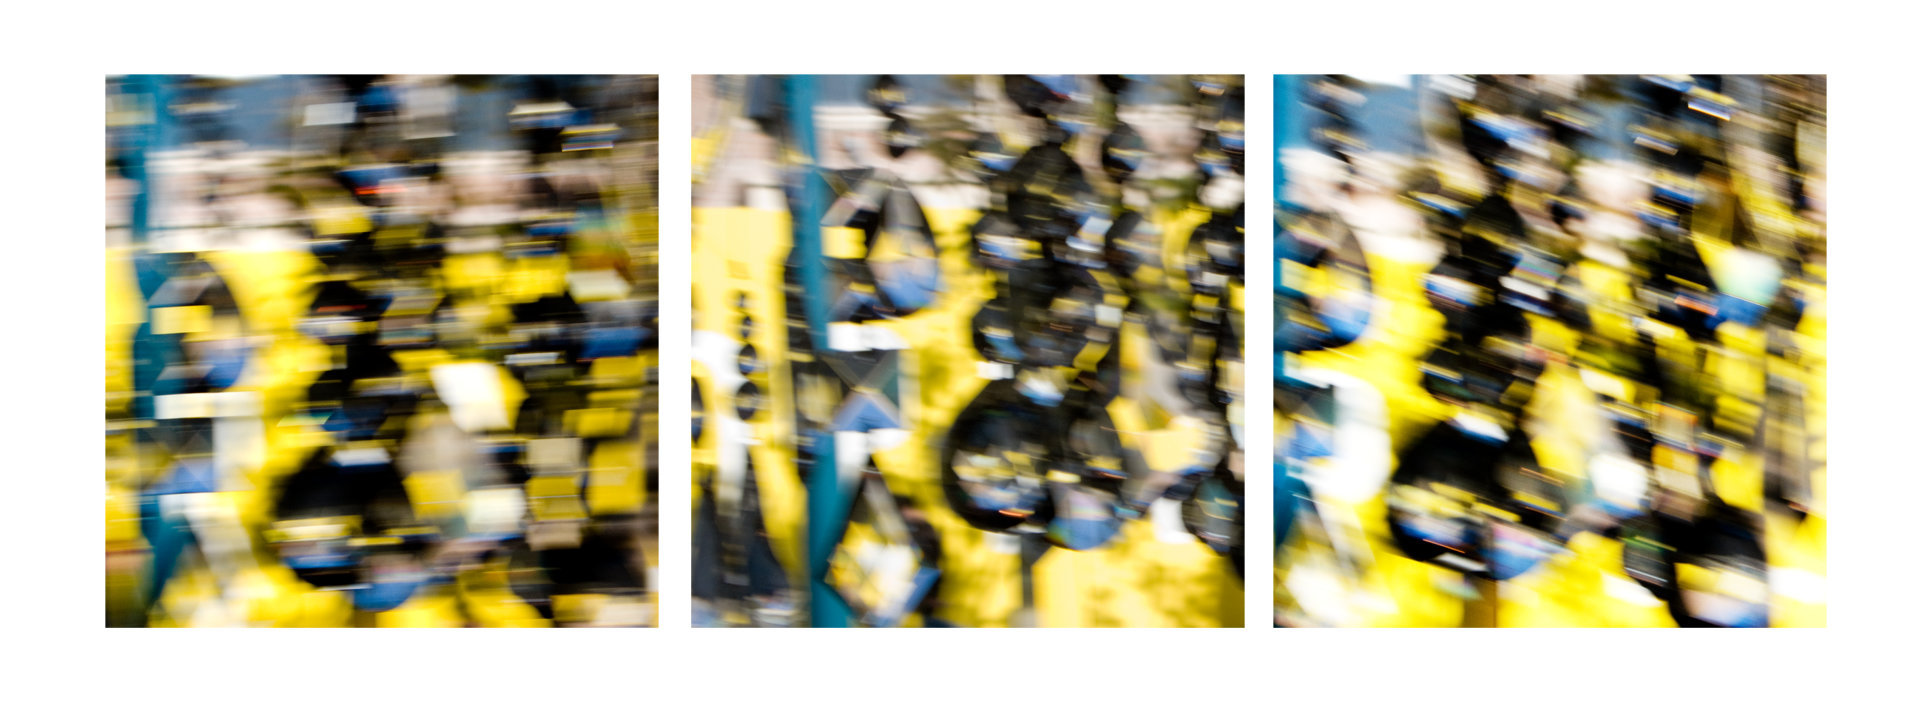 0029_Triptych1A.tif